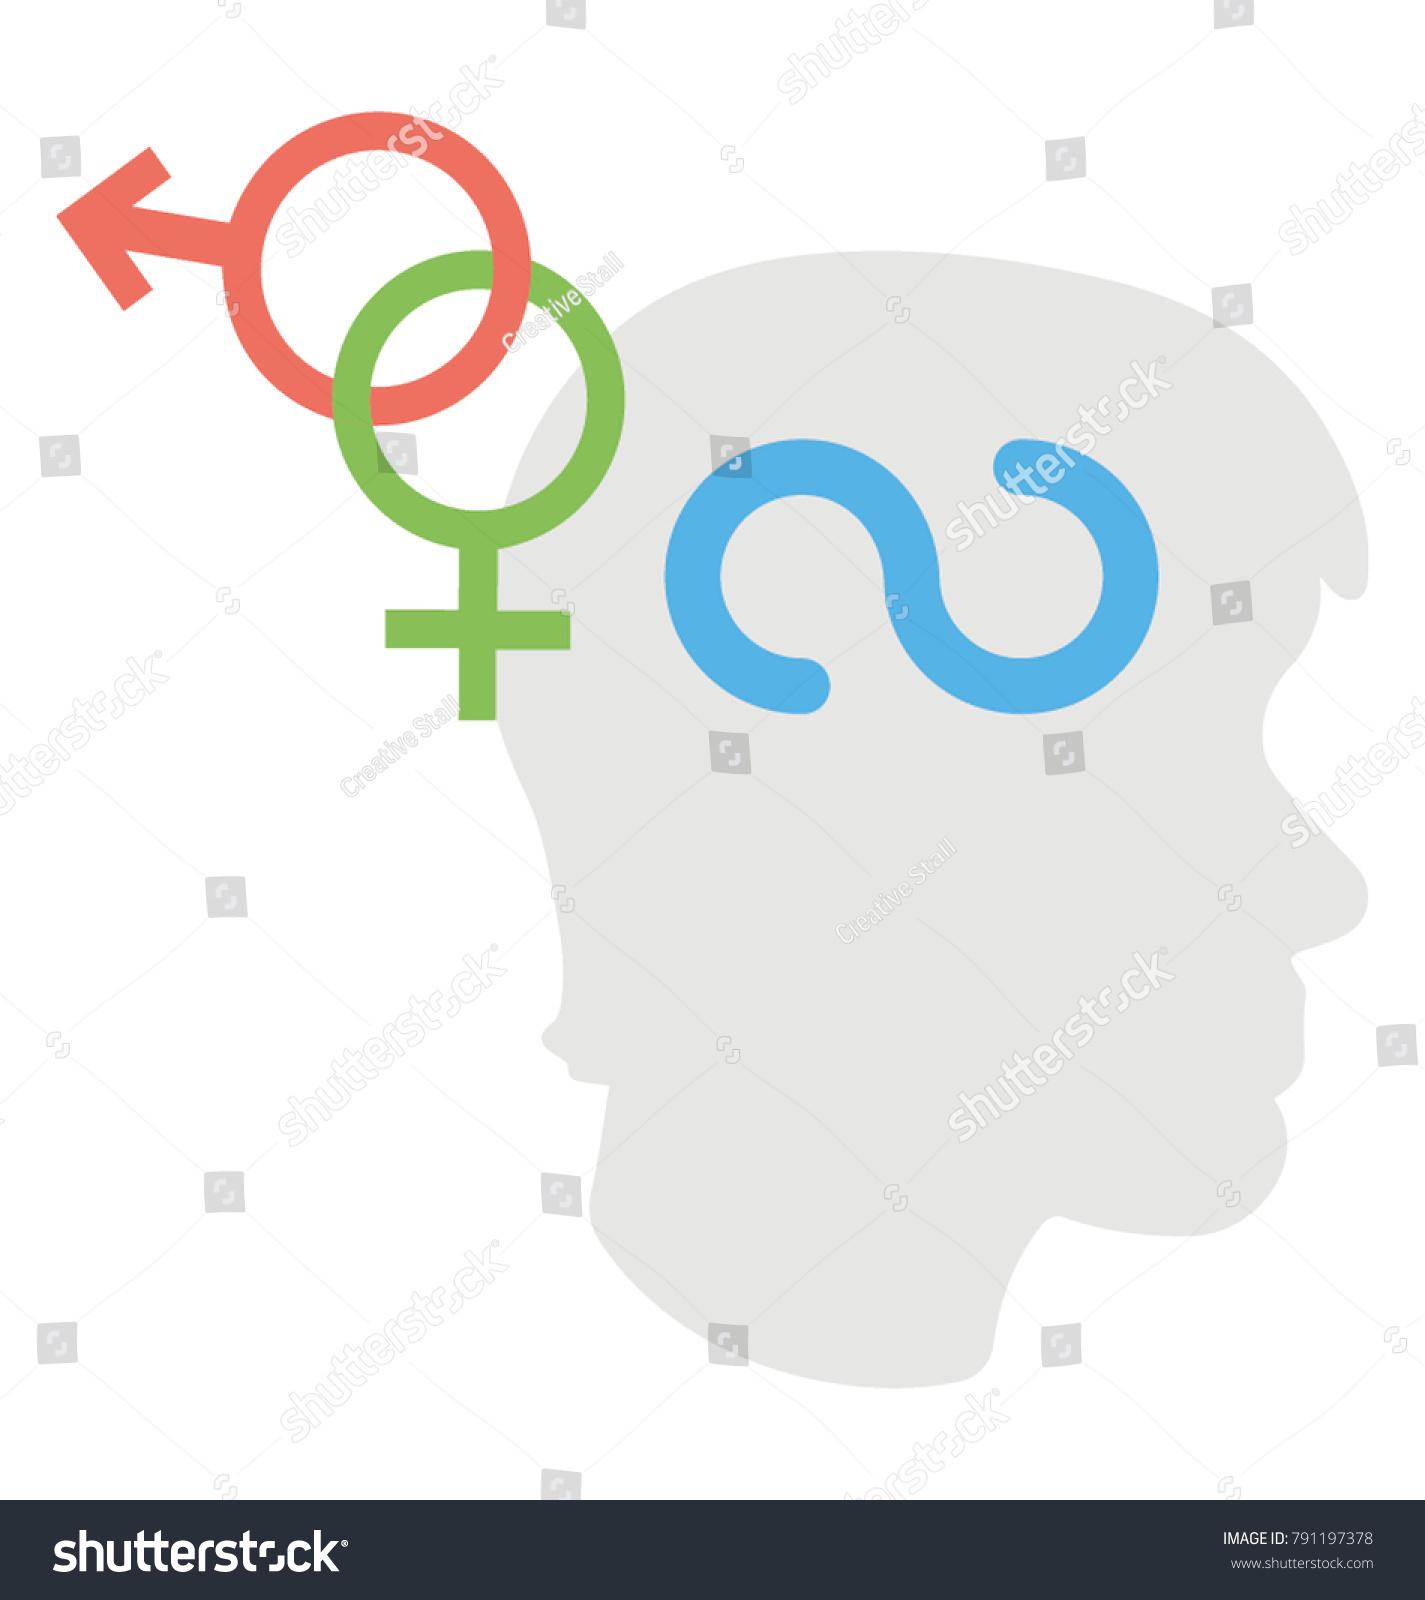 Zodiac sign compatibility sexually